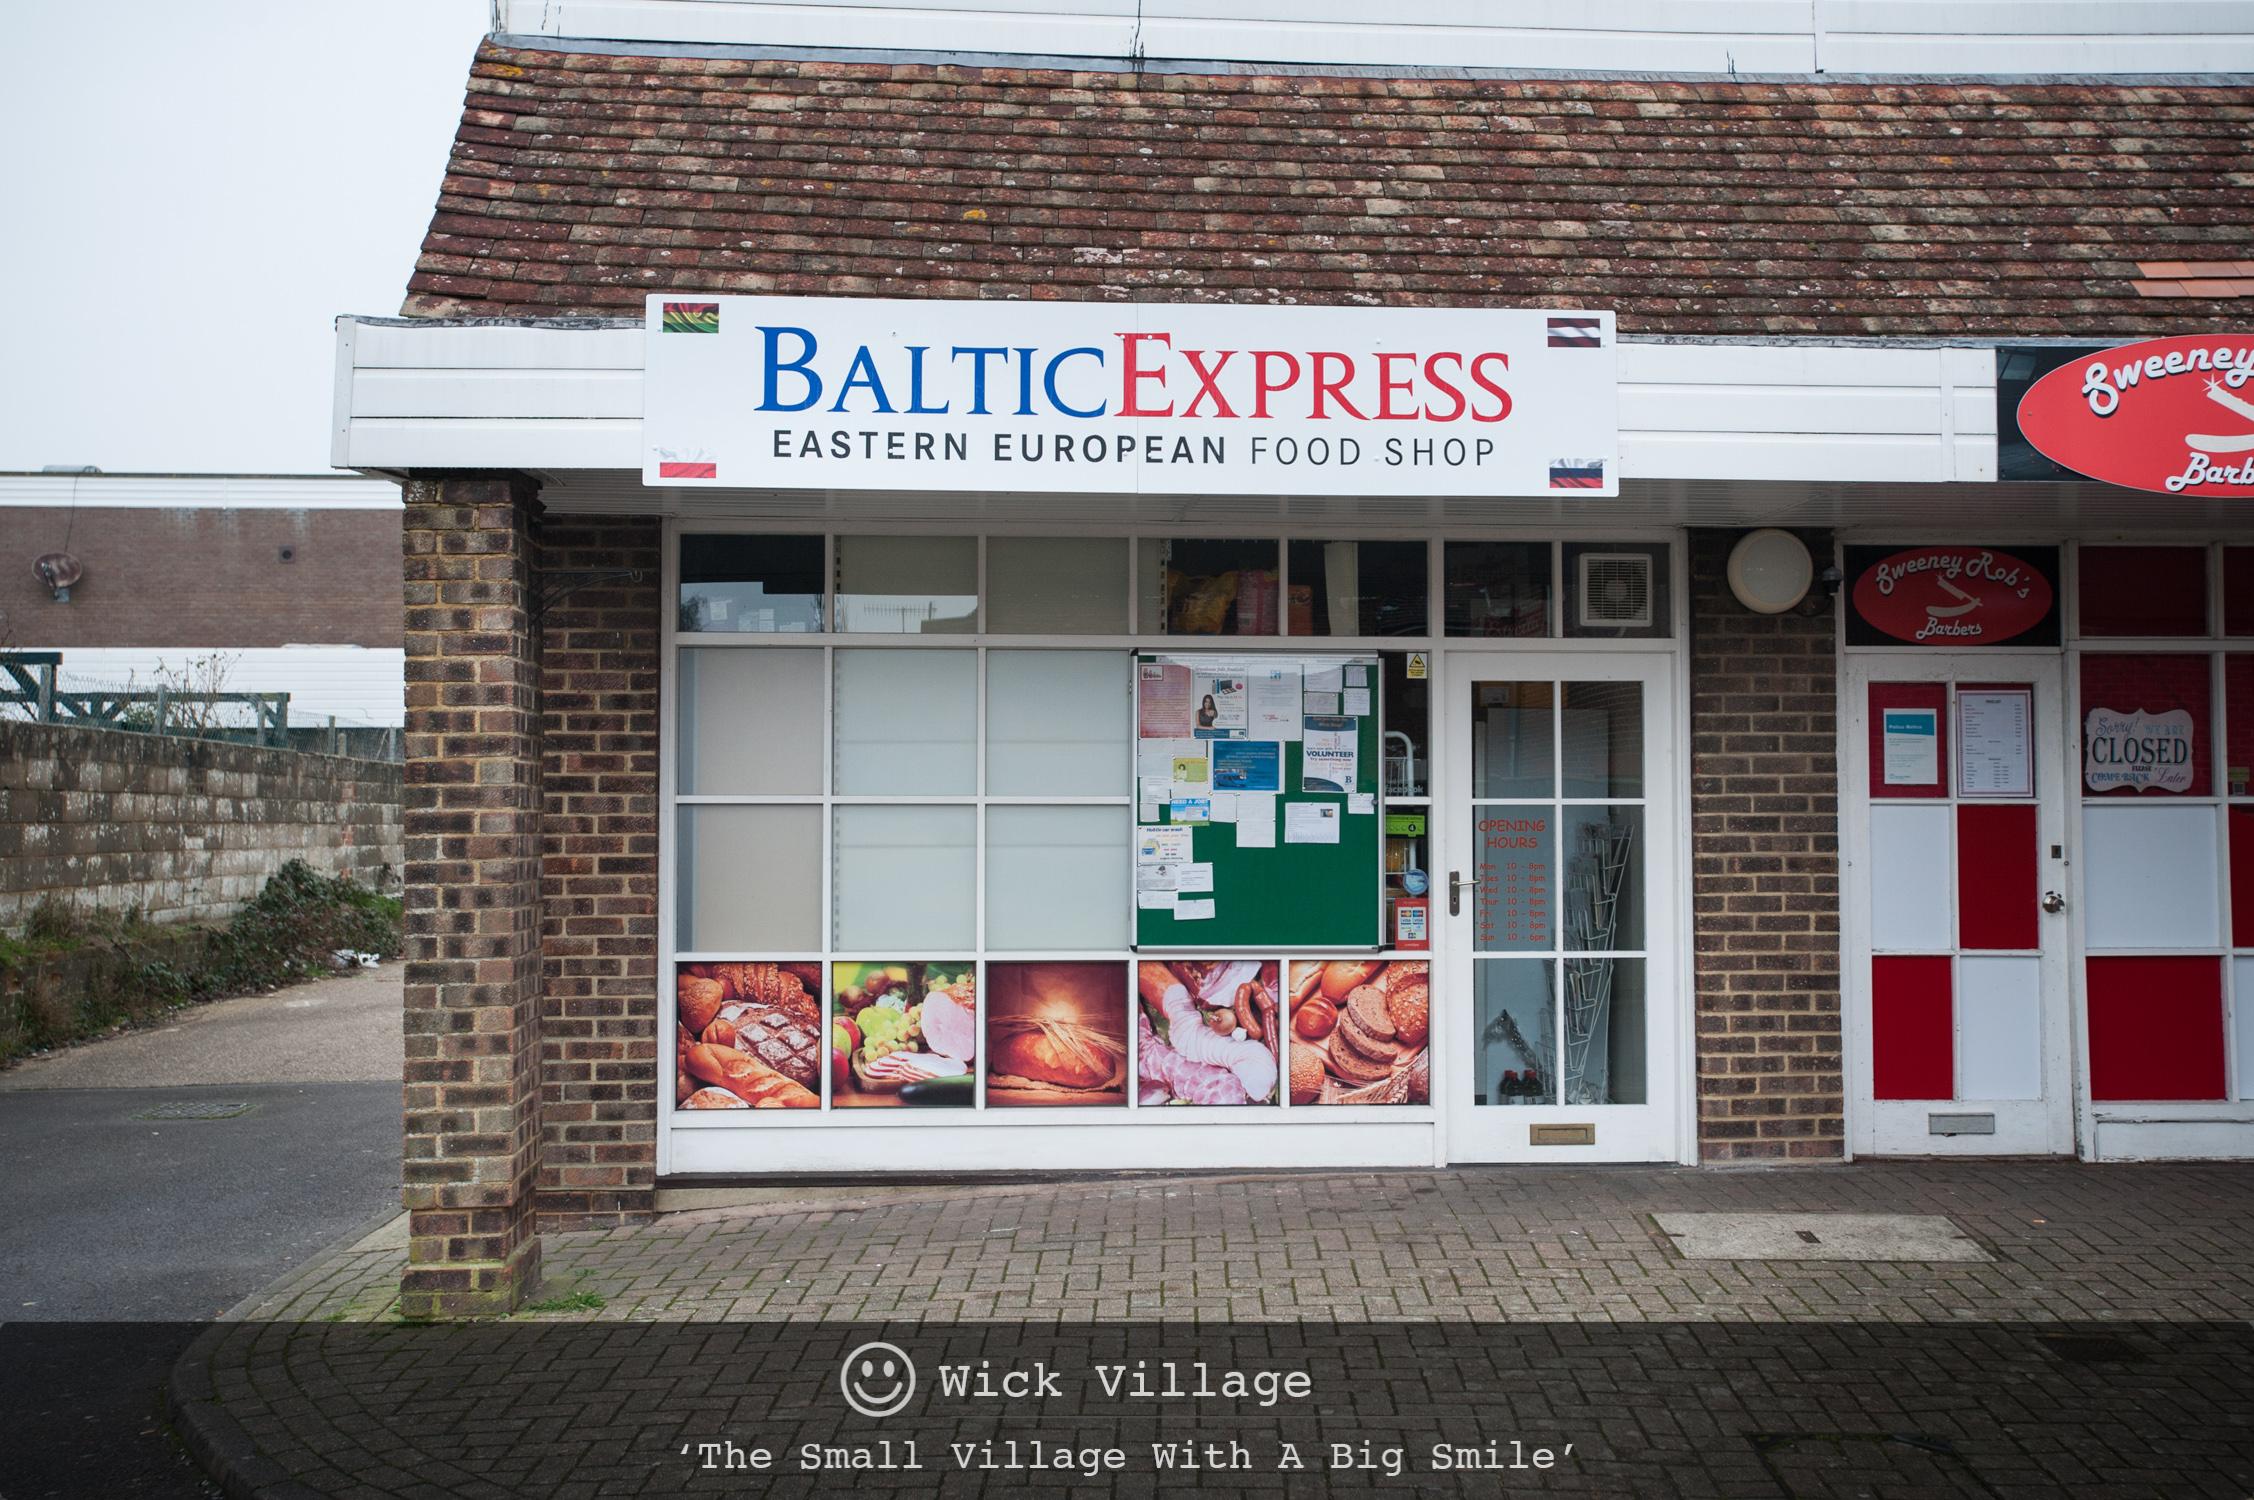 The Baltic Express, Wick Village, Littlehampton.